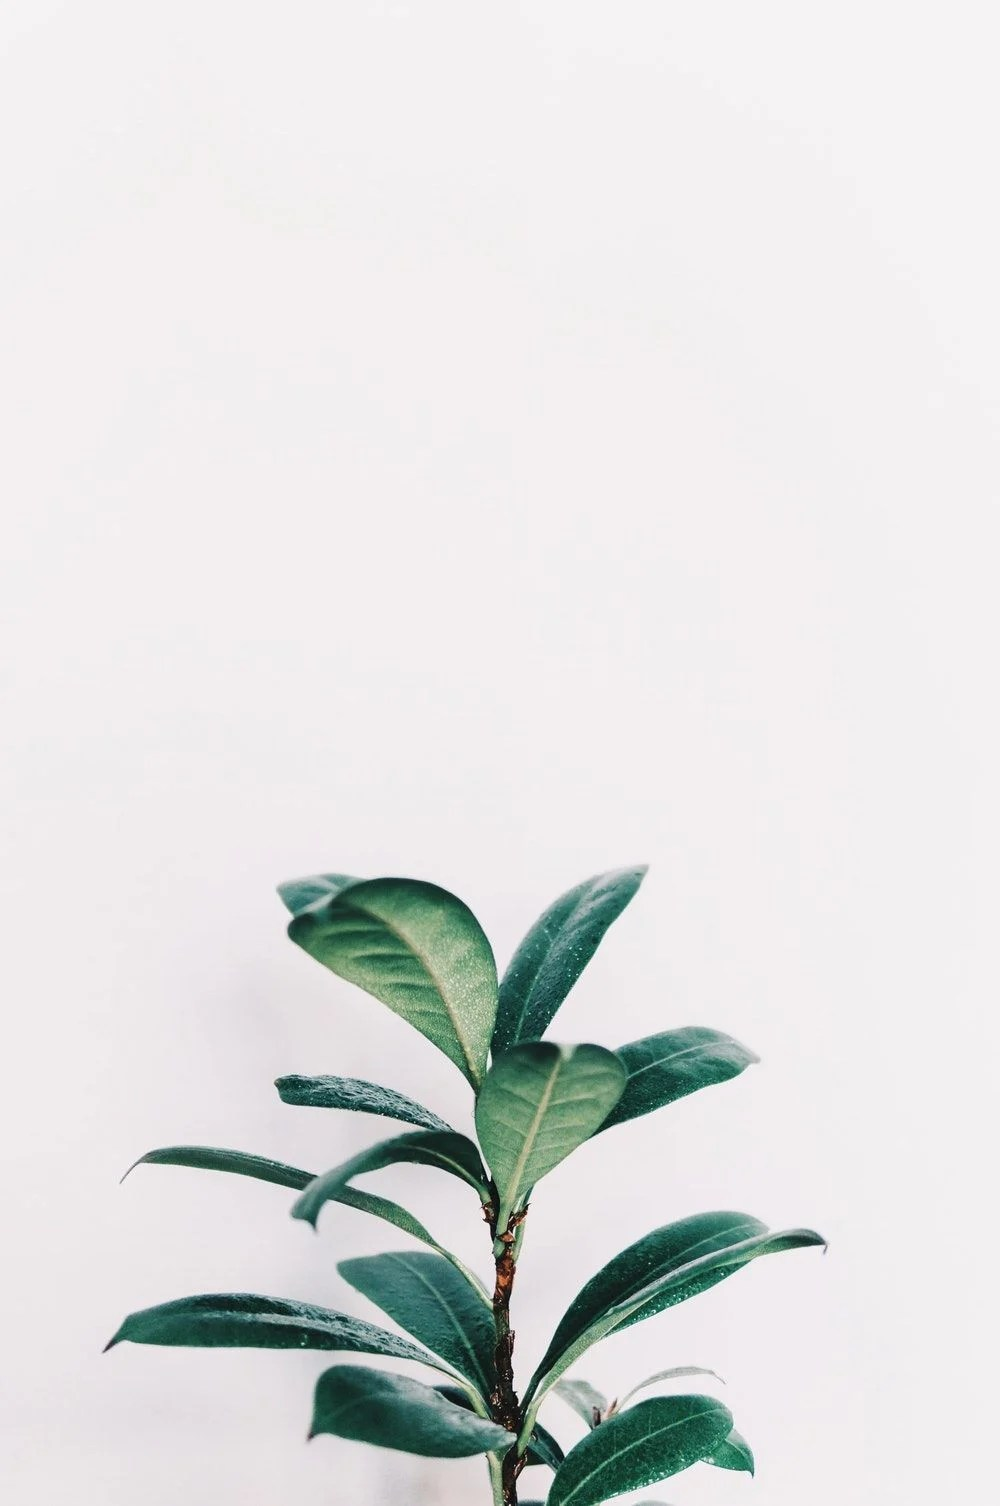 Minimalist Aesthetic Plant Wallpaper : minimalist, aesthetic, plant, wallpaper, Minimalist, Plant, Wallpapers, Backgrounds, WallpaperAccess